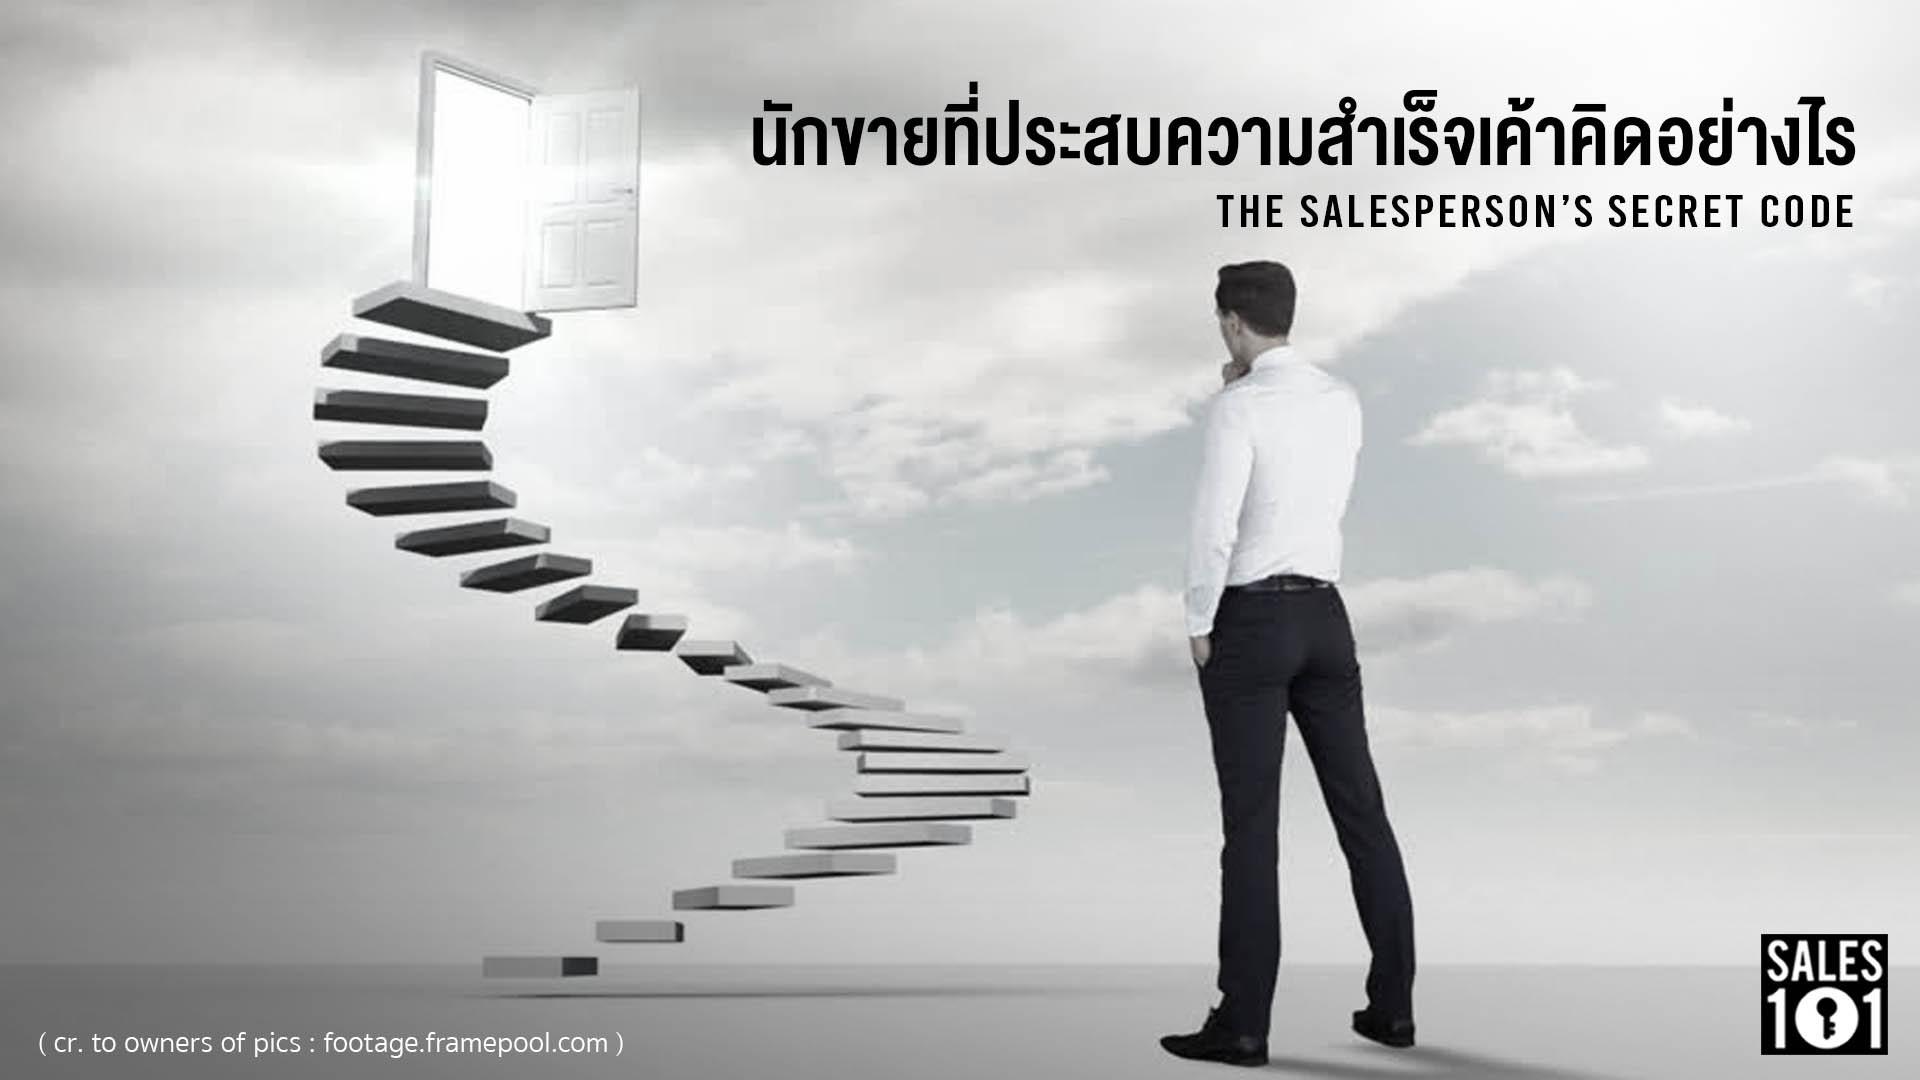 The Salespersons' Secret Code